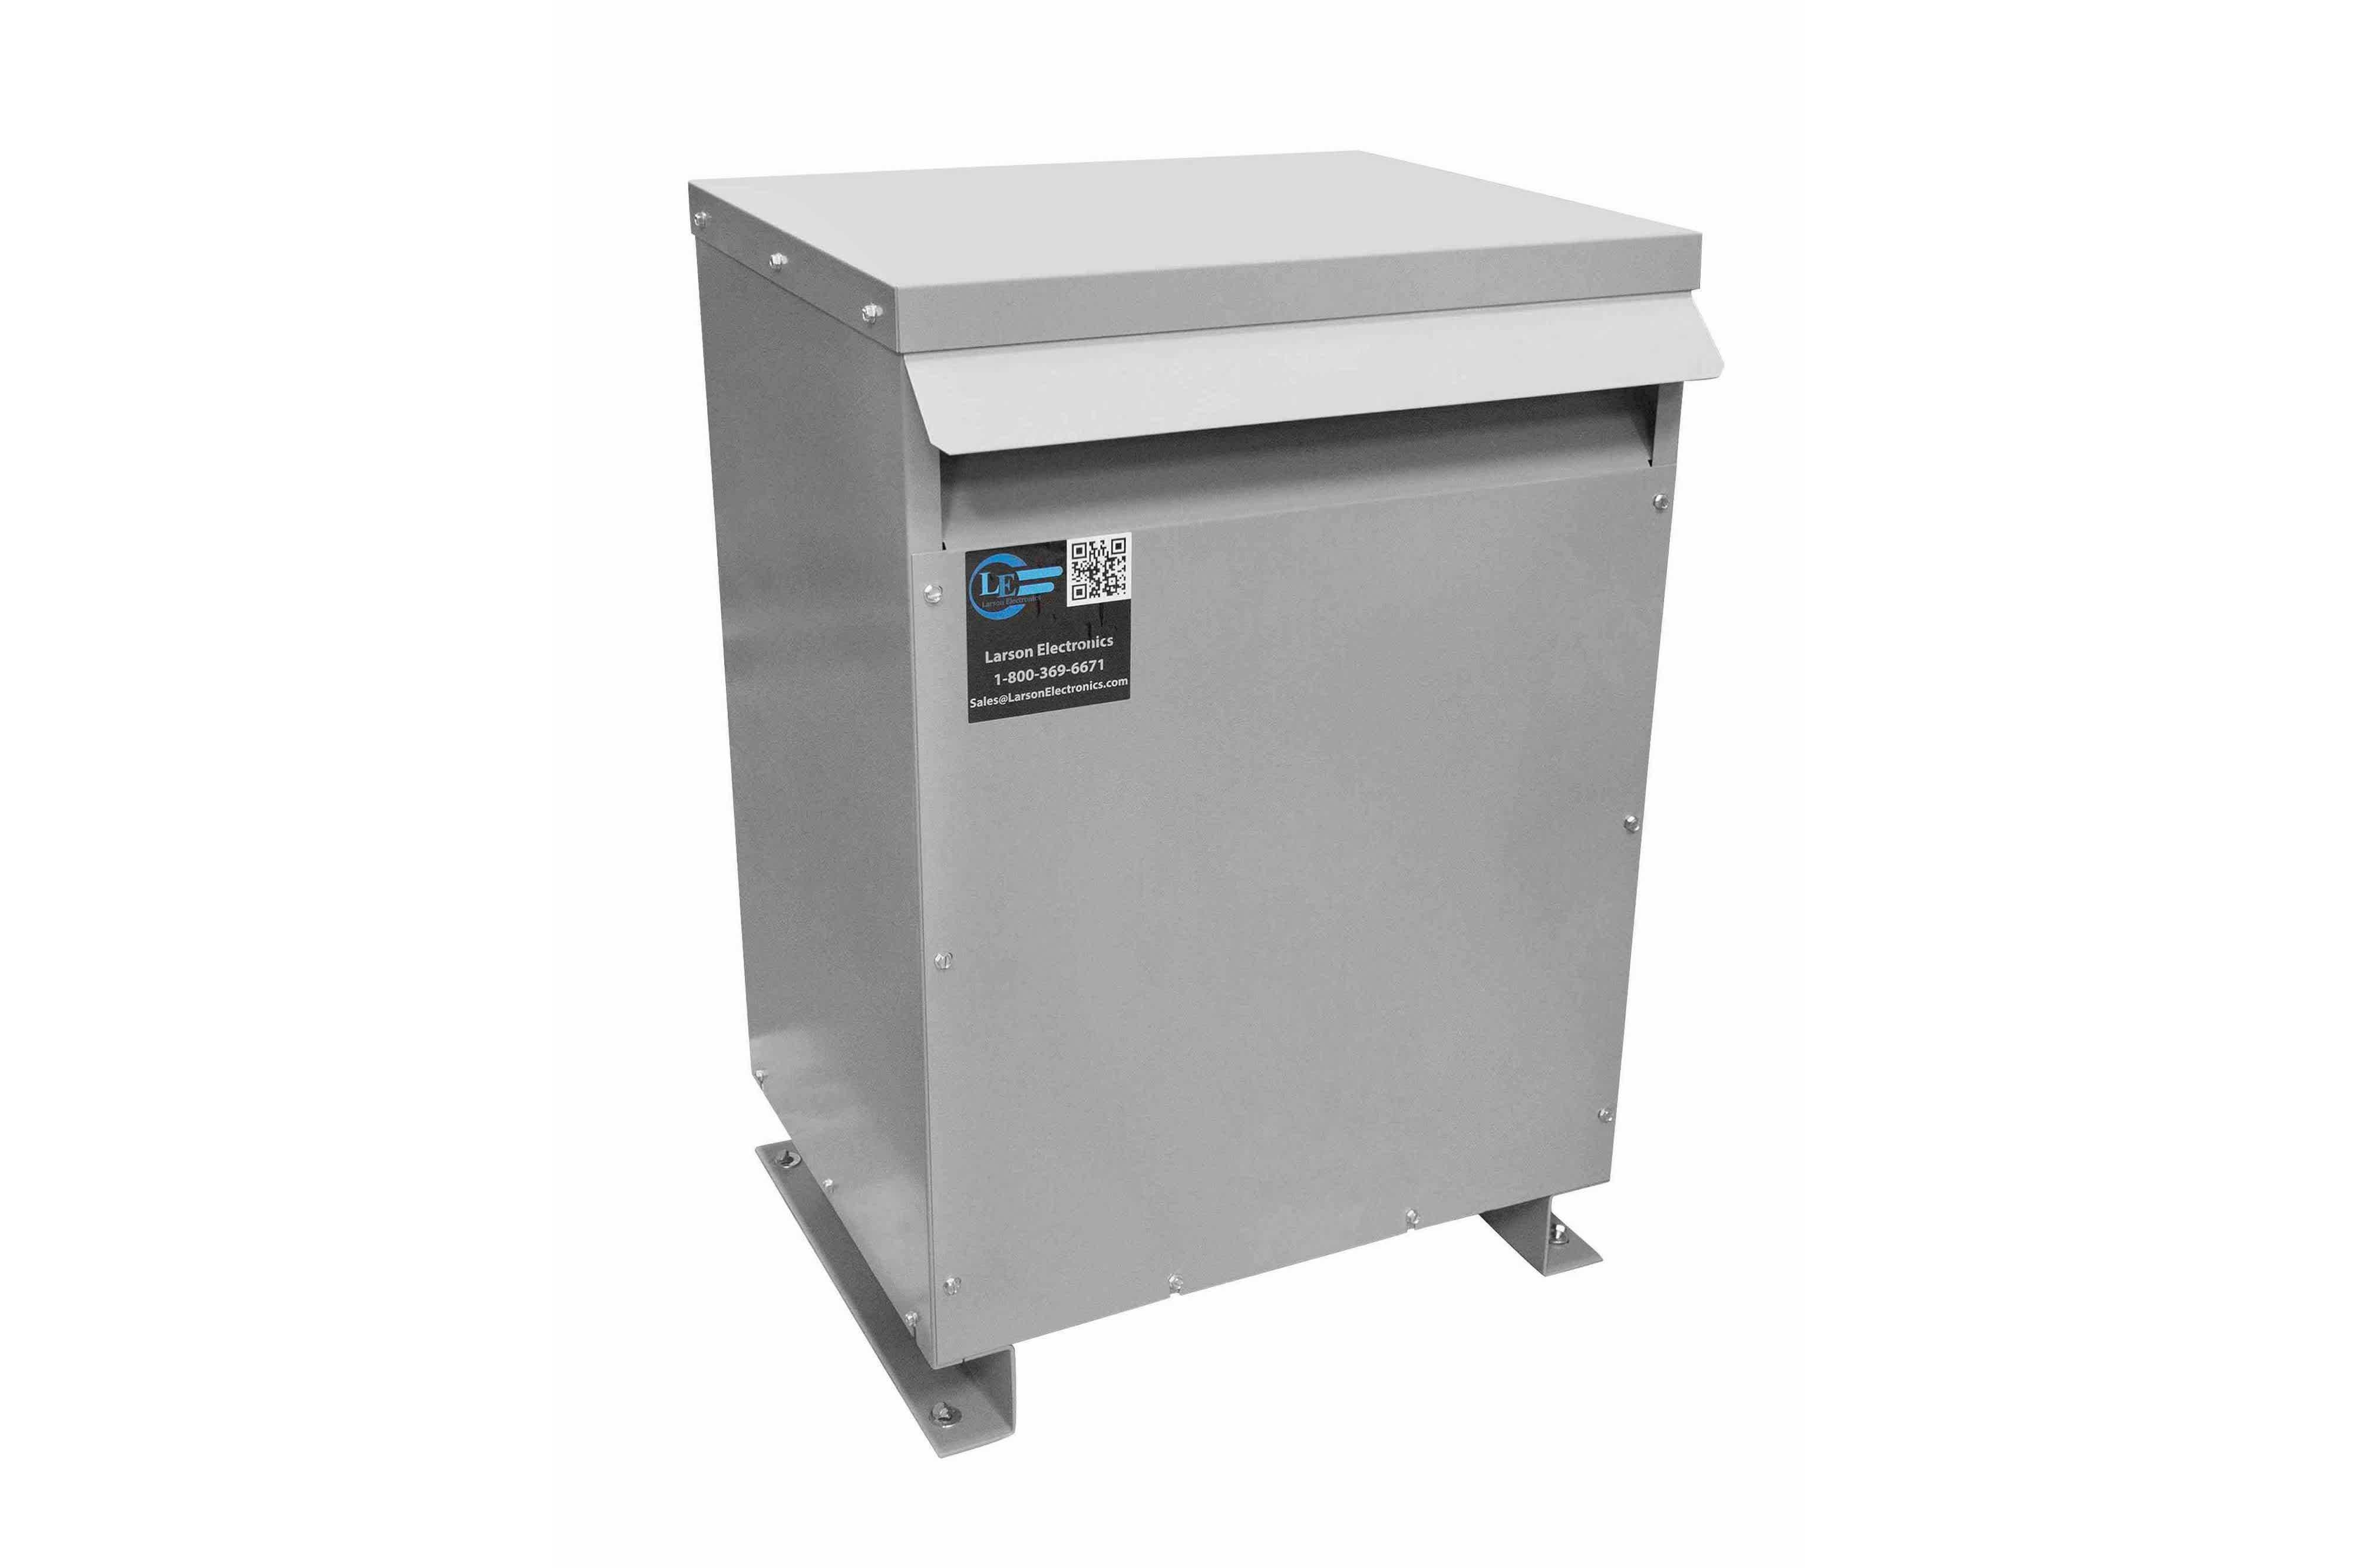 65 kVA 3PH Isolation Transformer, 440V Wye Primary, 240V/120 Delta Secondary, N3R, Ventilated, 60 Hz